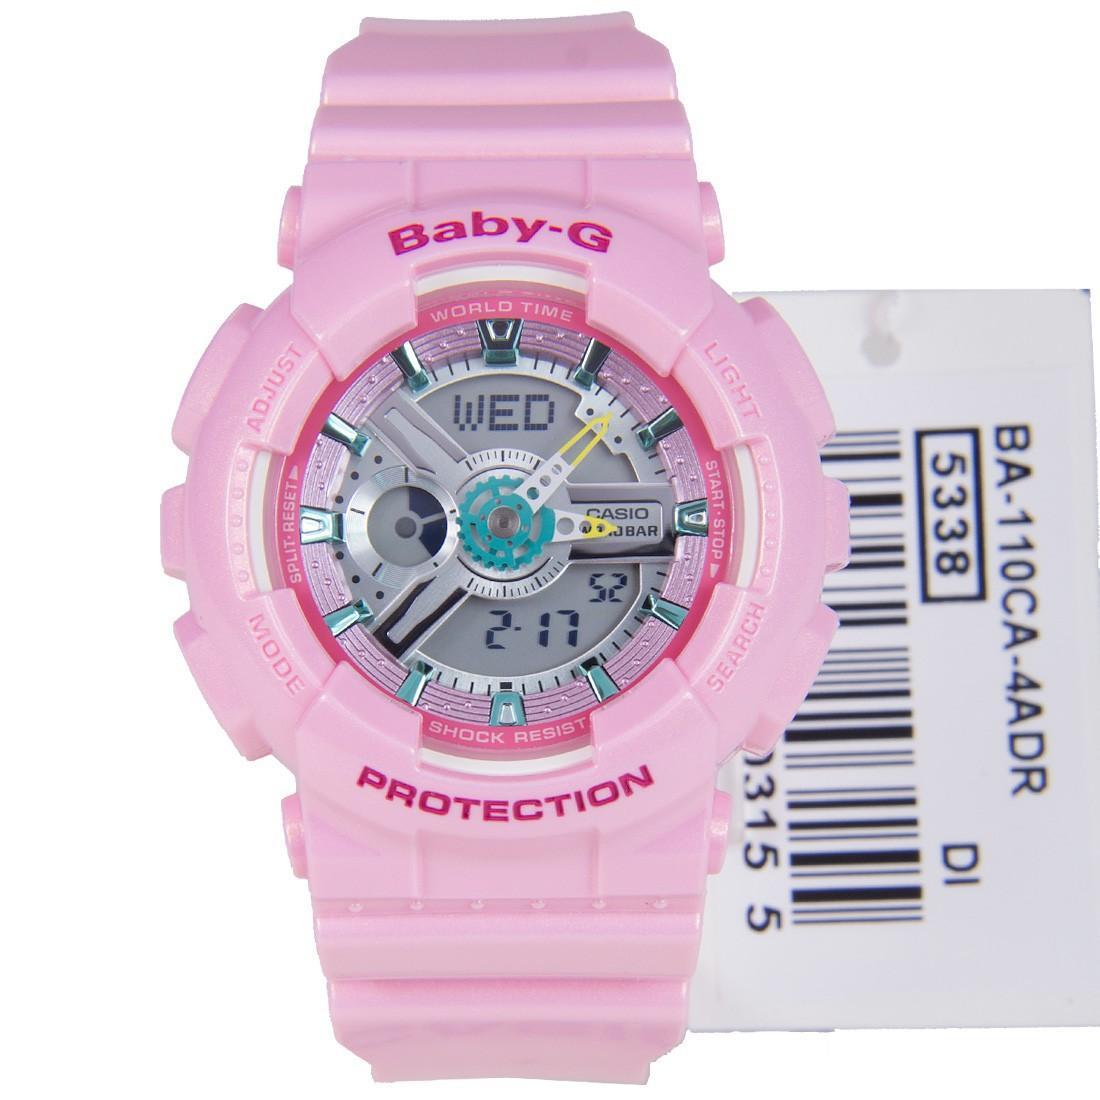 Casio Standard Lrw 200h 4b2v Jam Tangan Wanita Strap Resin Pink Lm Baby G Bgs 180 3b Putih Ba 110ca 4a